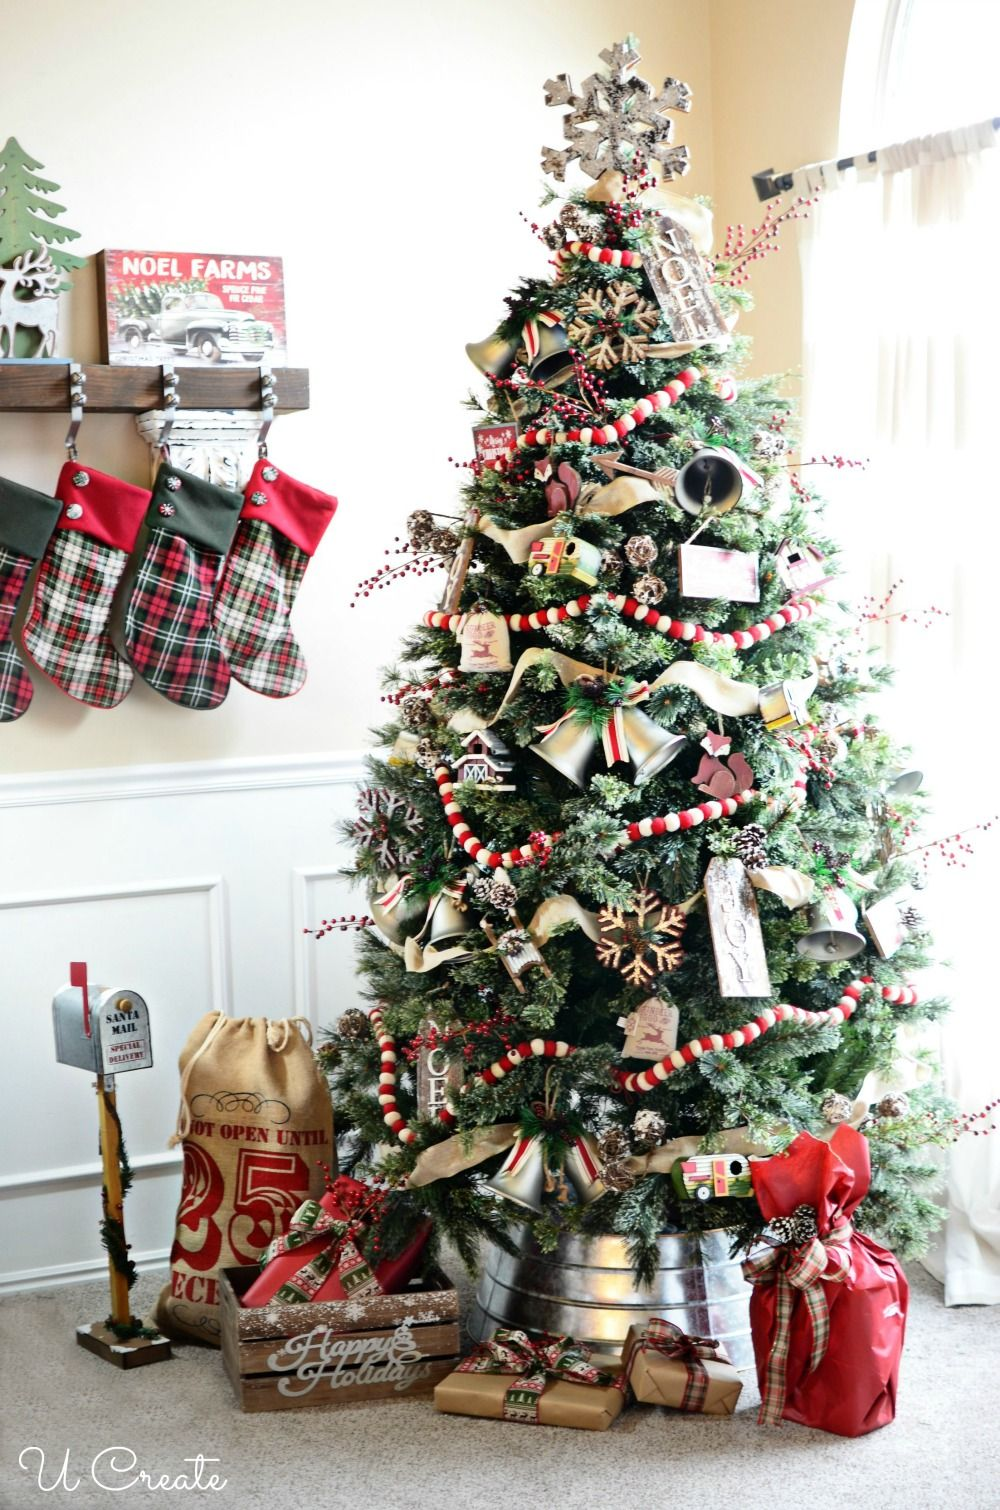 A Country Christmas Tree Arvores De Natal Rusticas Natal